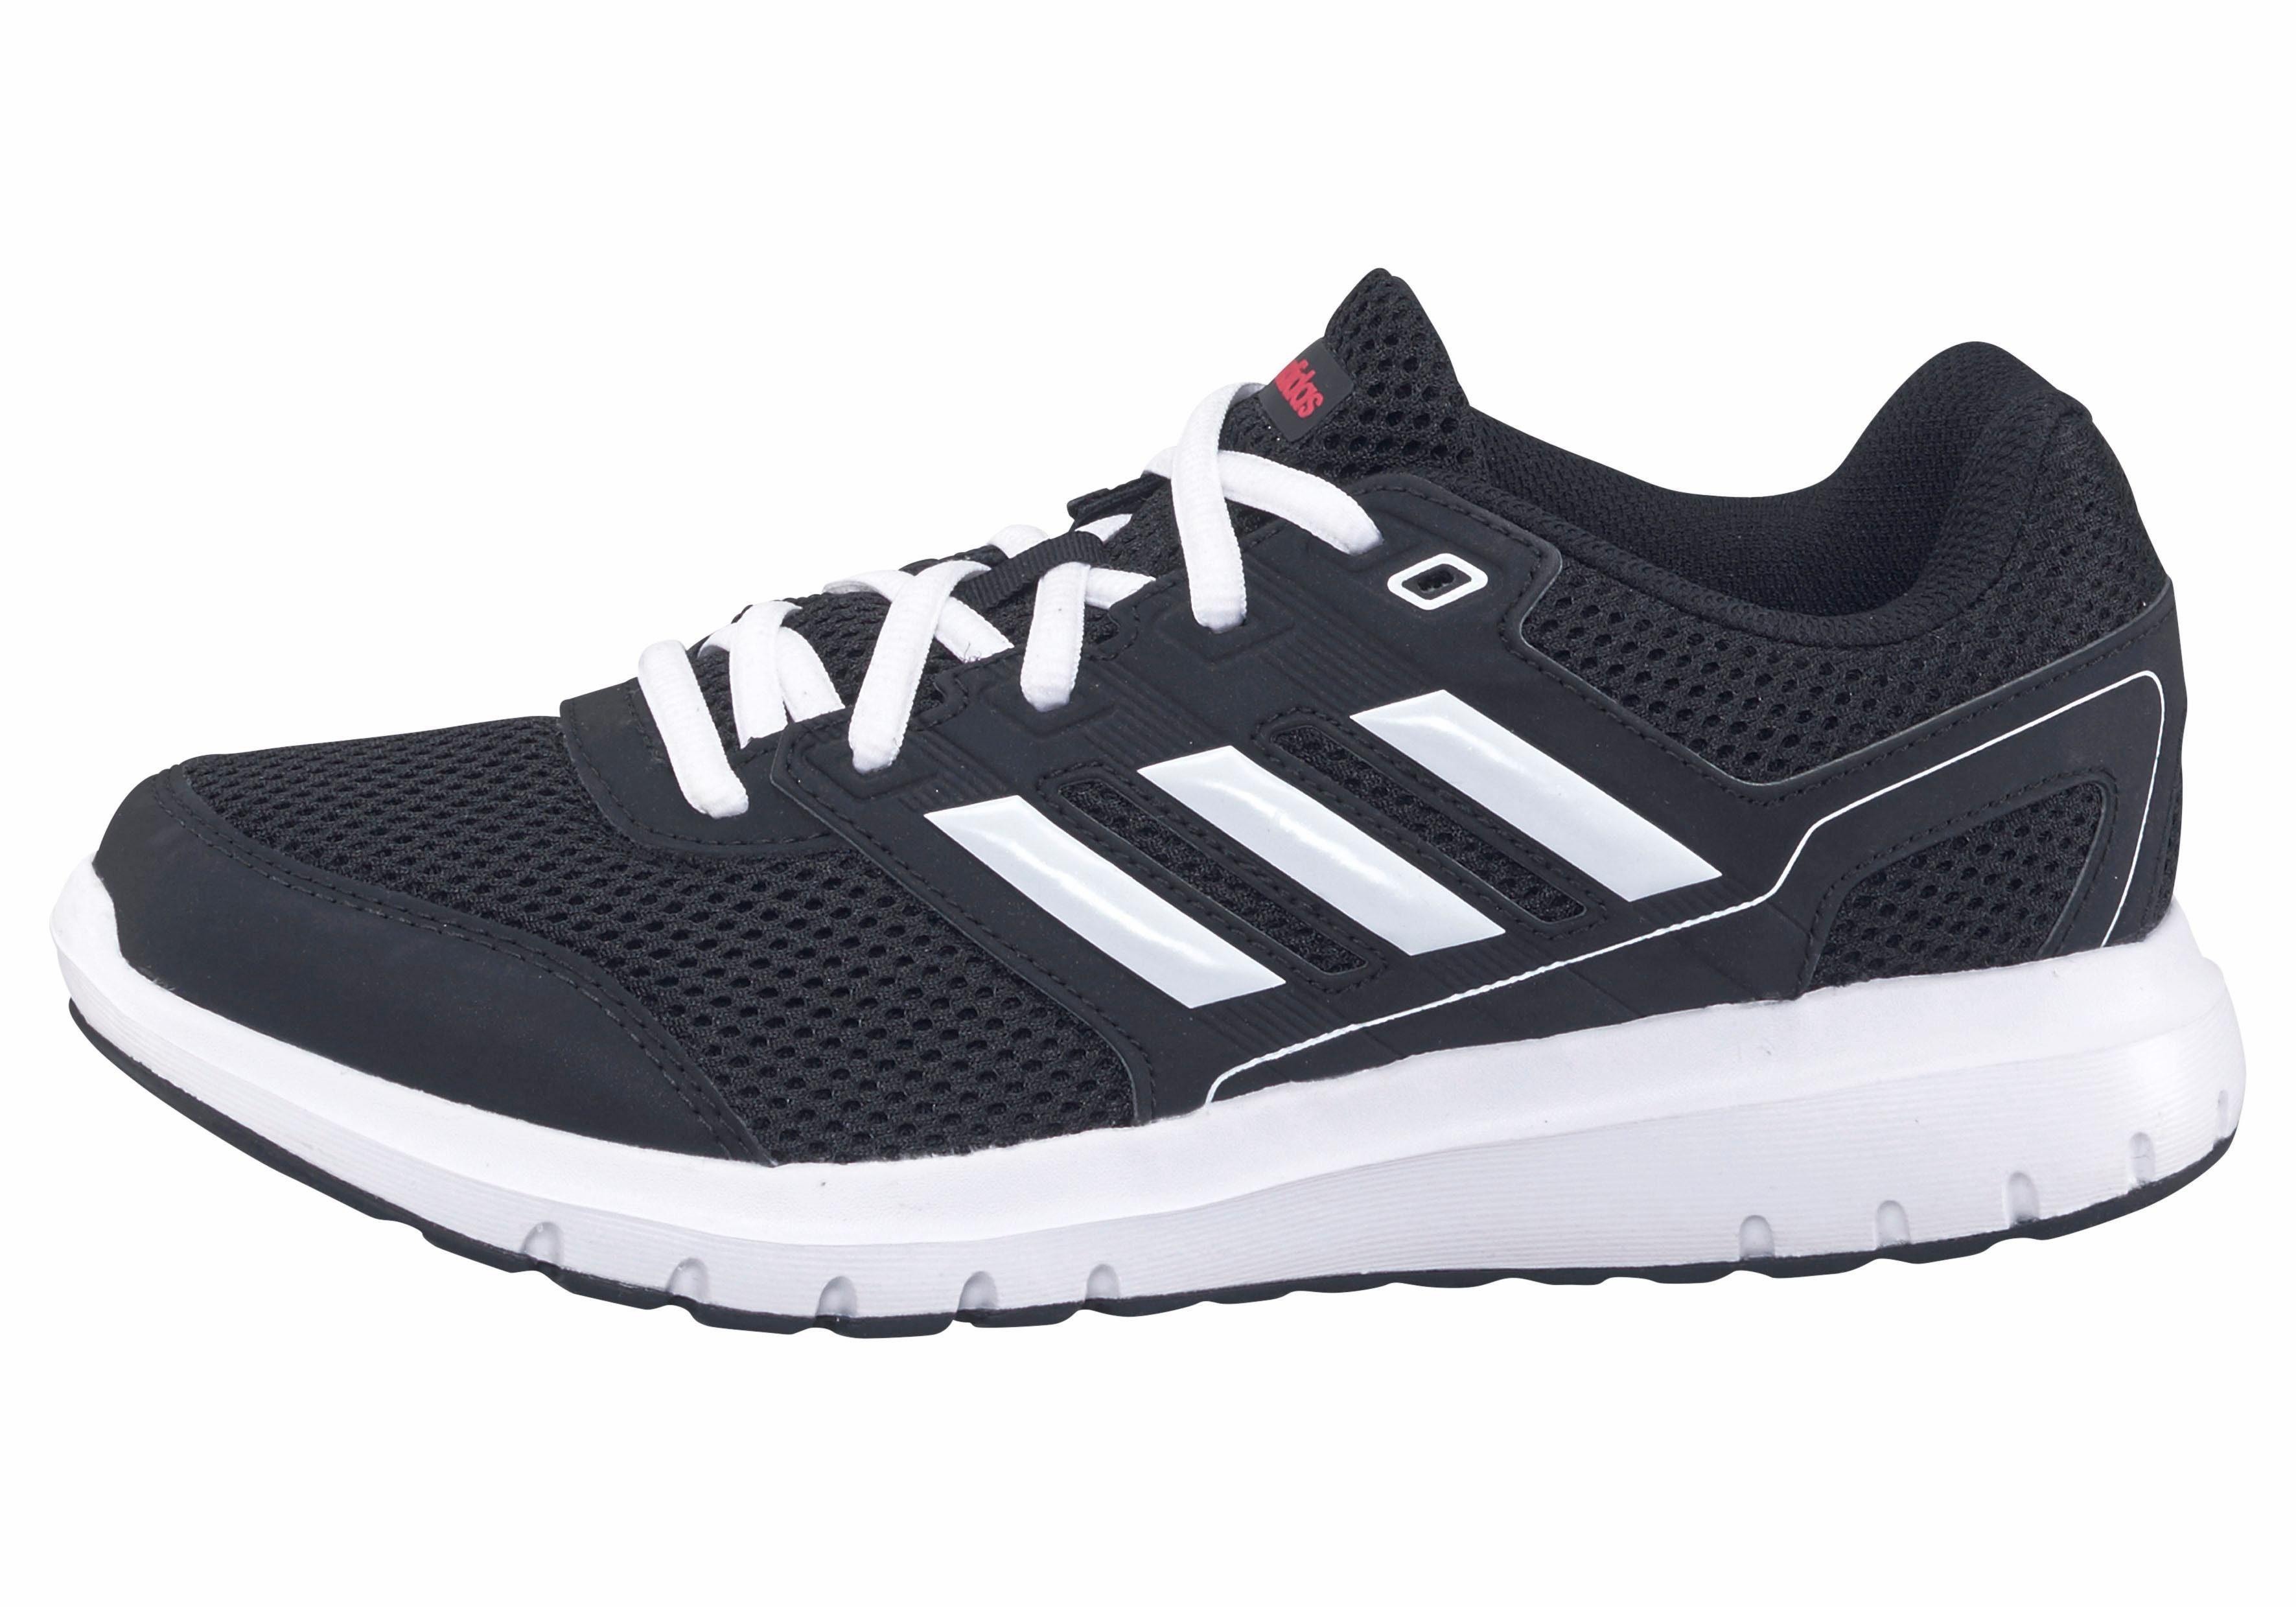 Adidas - Duramo Lite 2.0 - Neutre Chaussure De Course LddXA